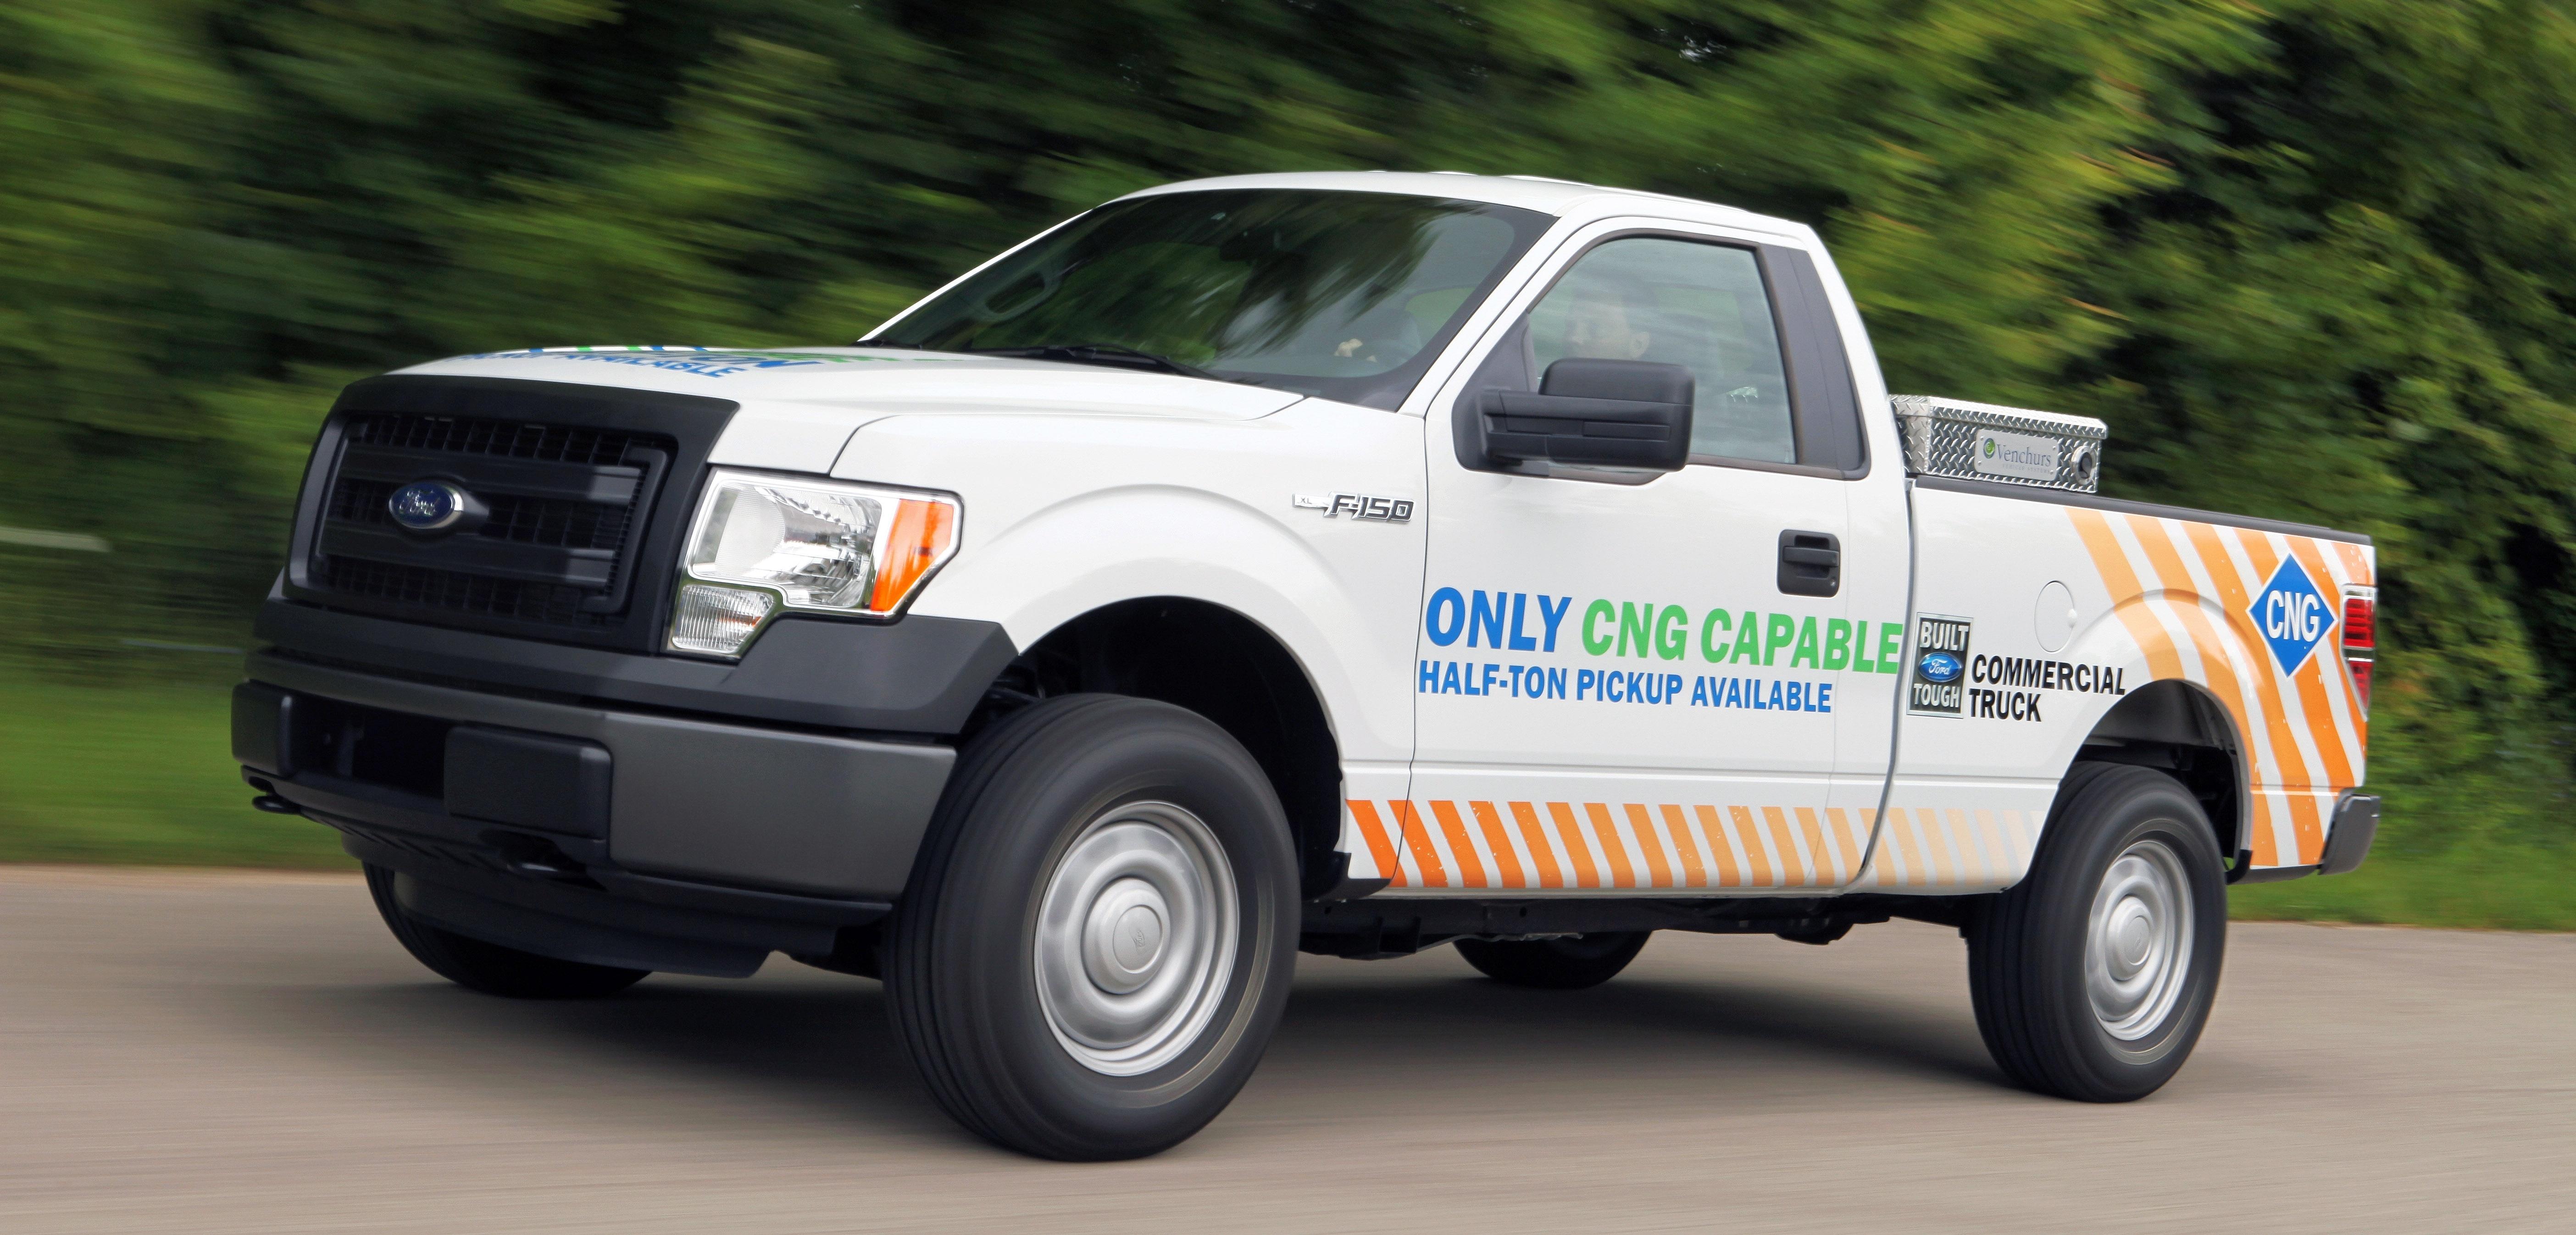 5.6 CNG-LNG-Vehicles-credit-Ford-Motor-Company-290881-edited.jpg